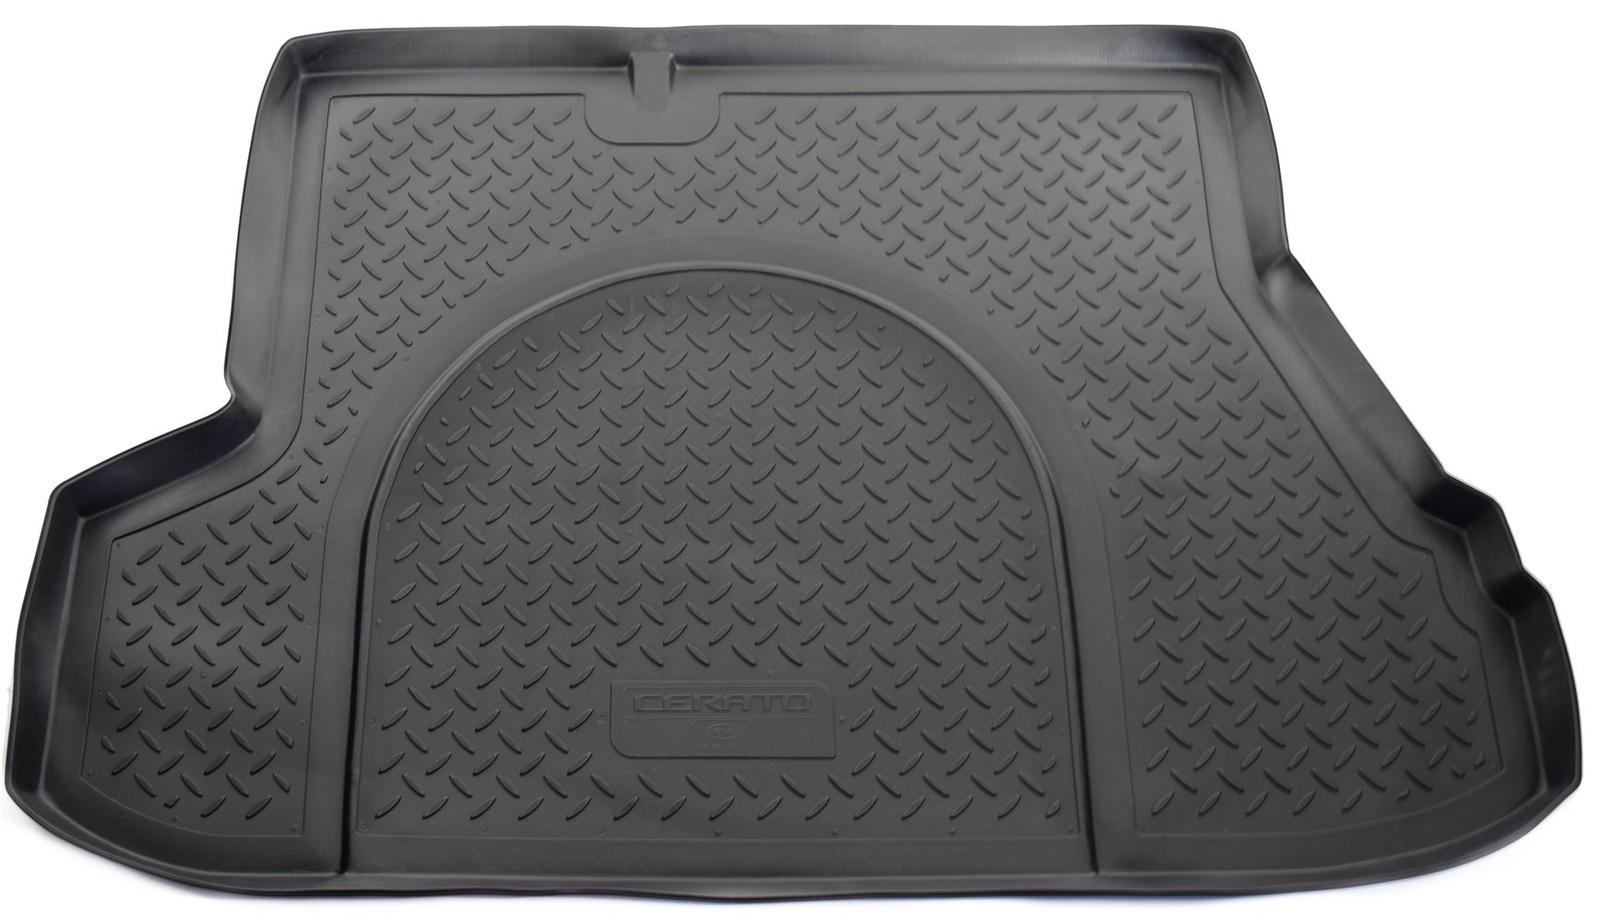 Коврик багажника Norplast для Kia Cerato FE 07 SD 2007-2009, NPL-P-43-17, черный